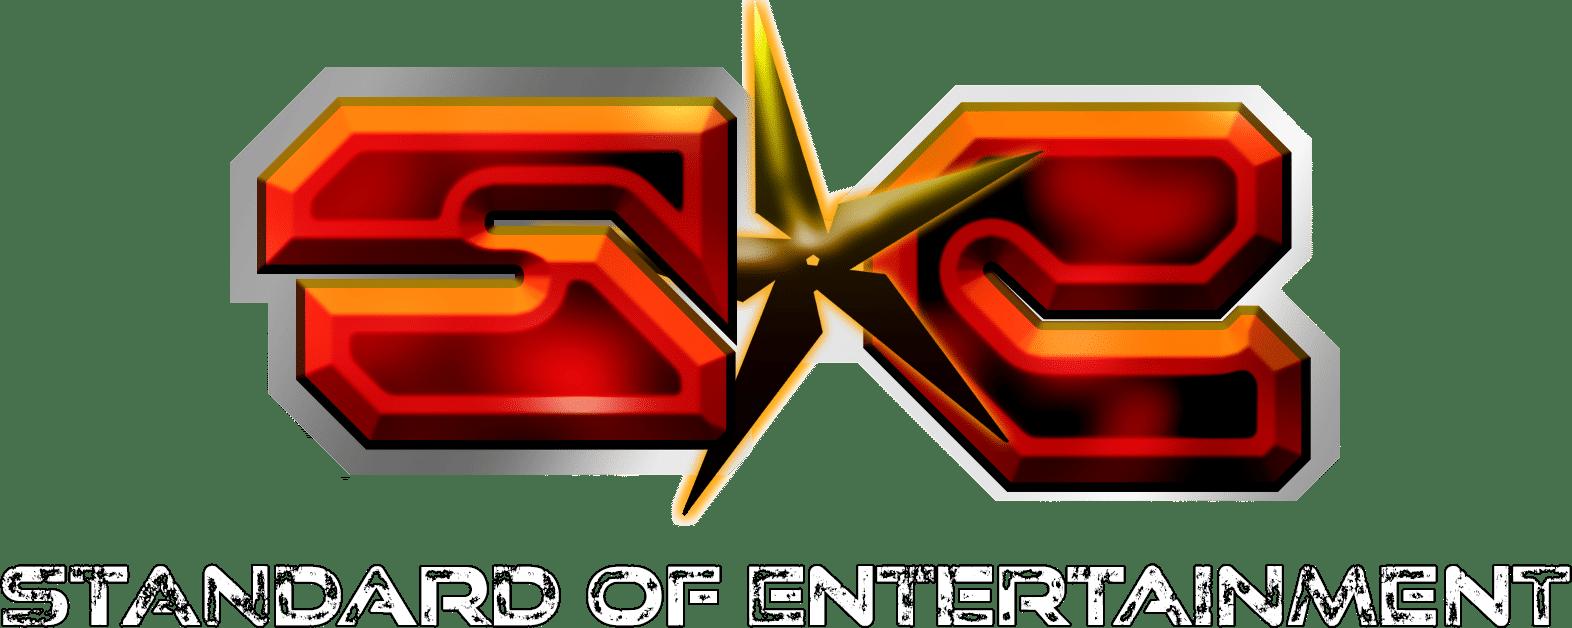 Standard of Entertainment